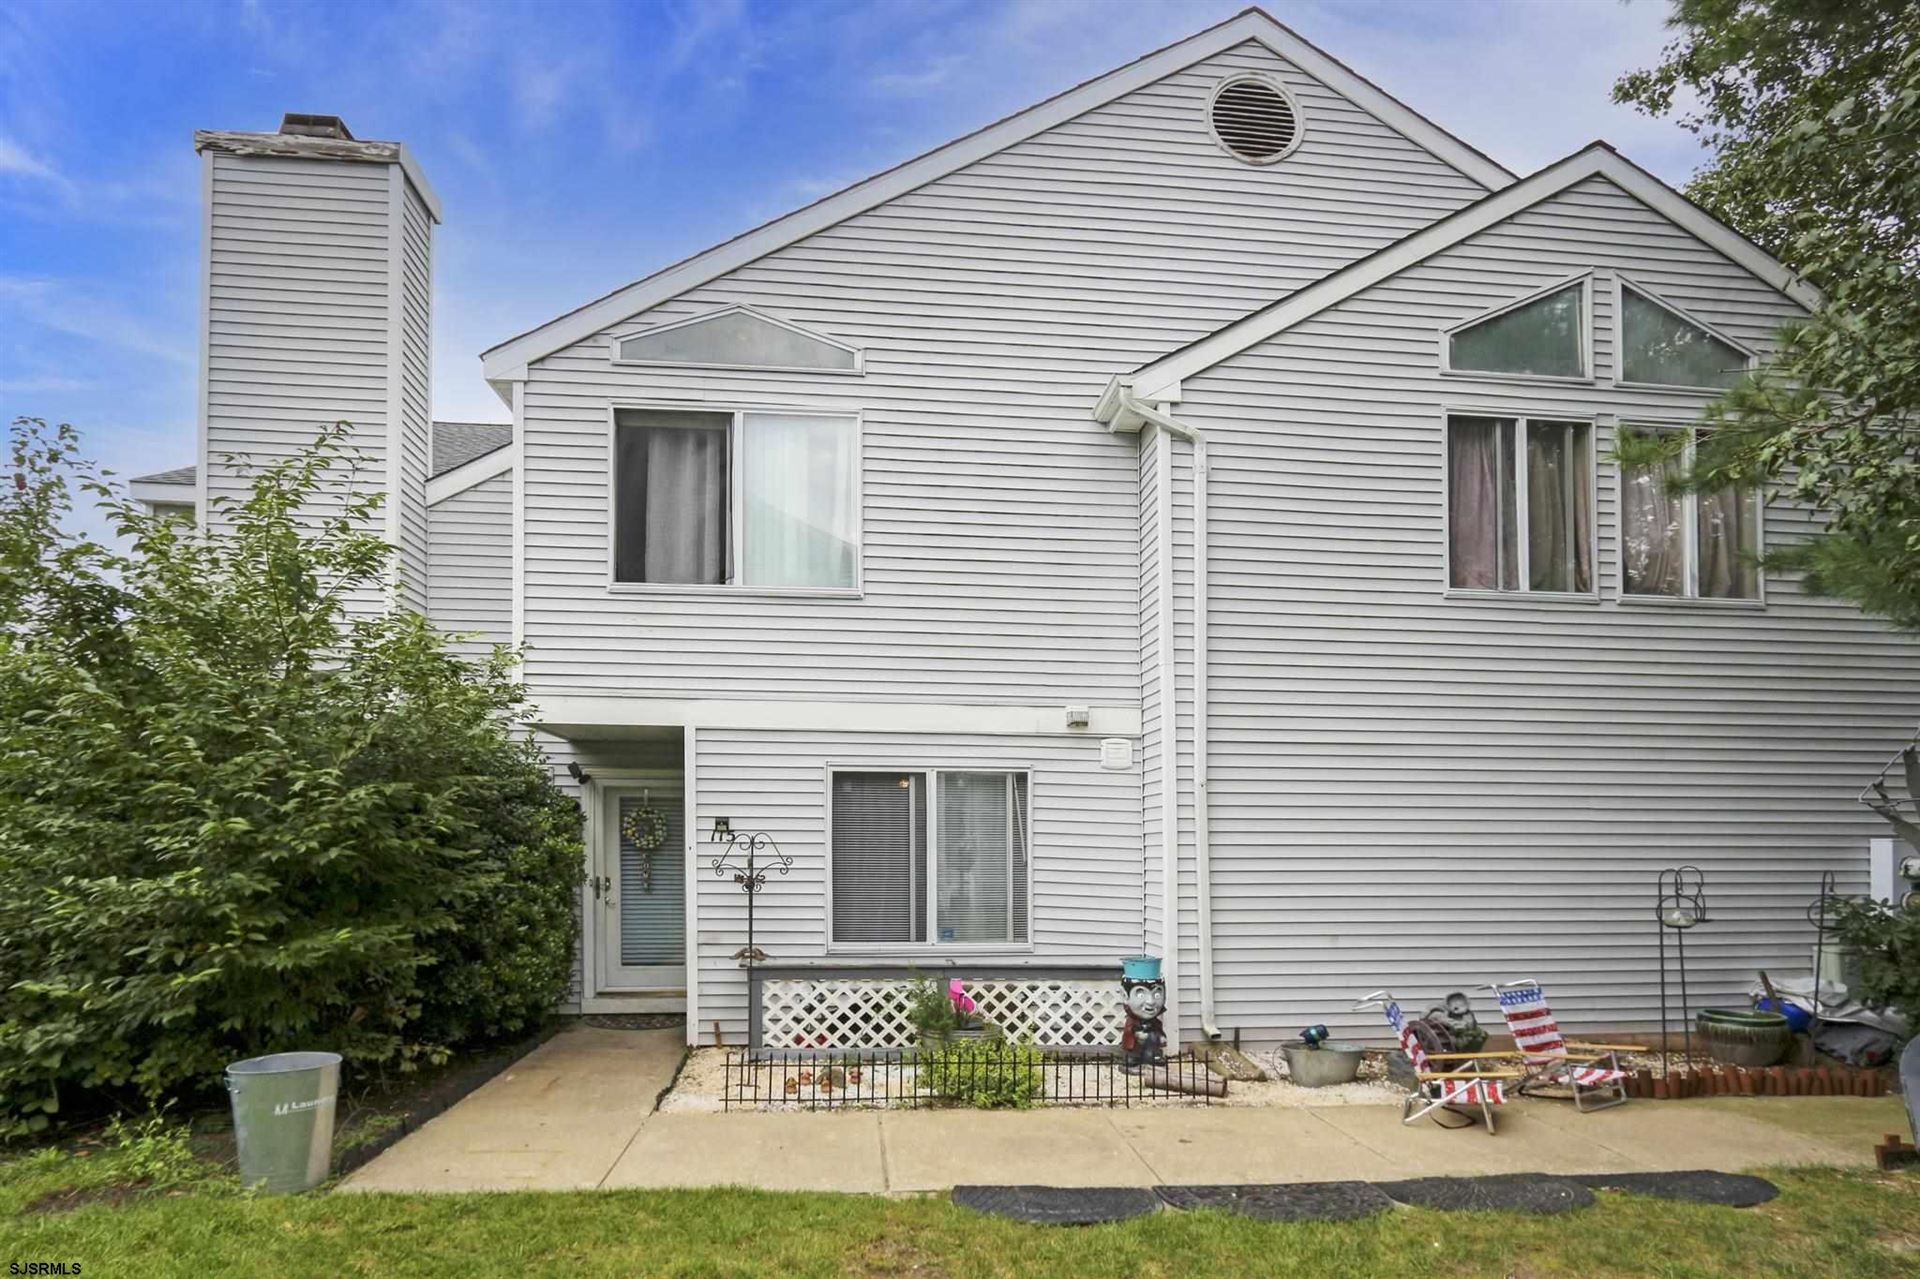 115 Heather Croft, Egg Harbor, NJ 08234 - #: 556807